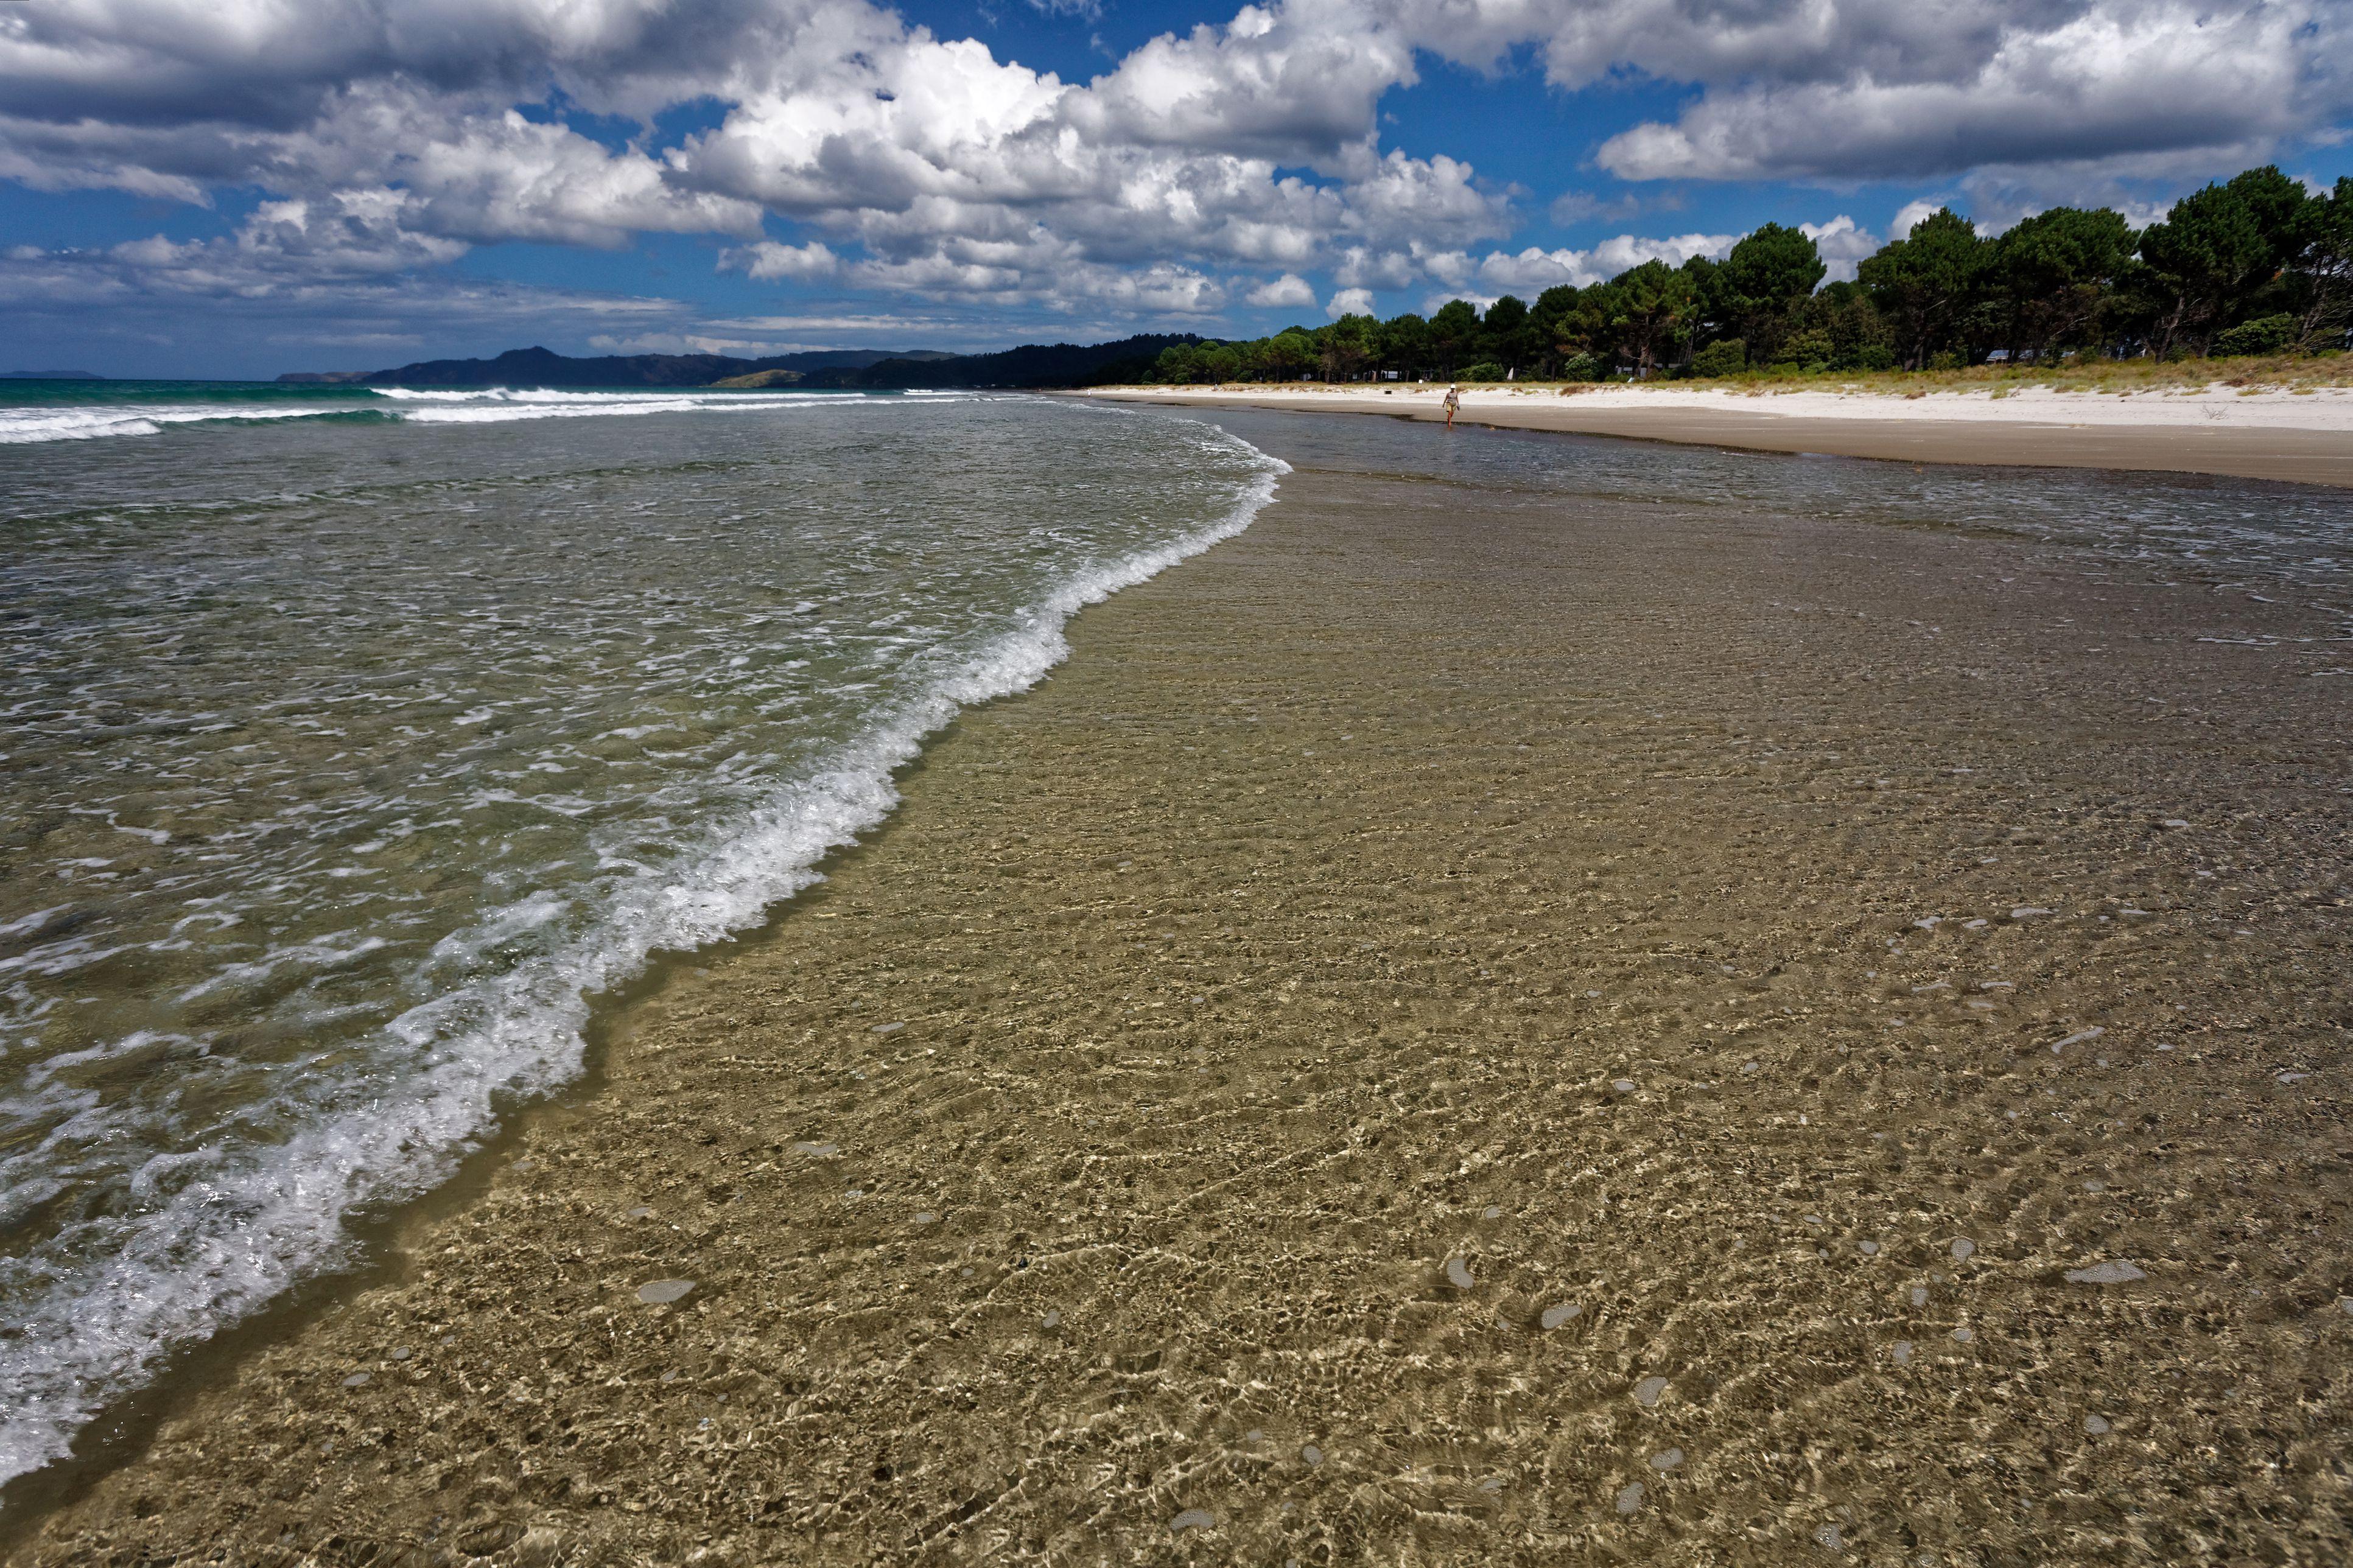 Matarangi Beach in the Coromandel